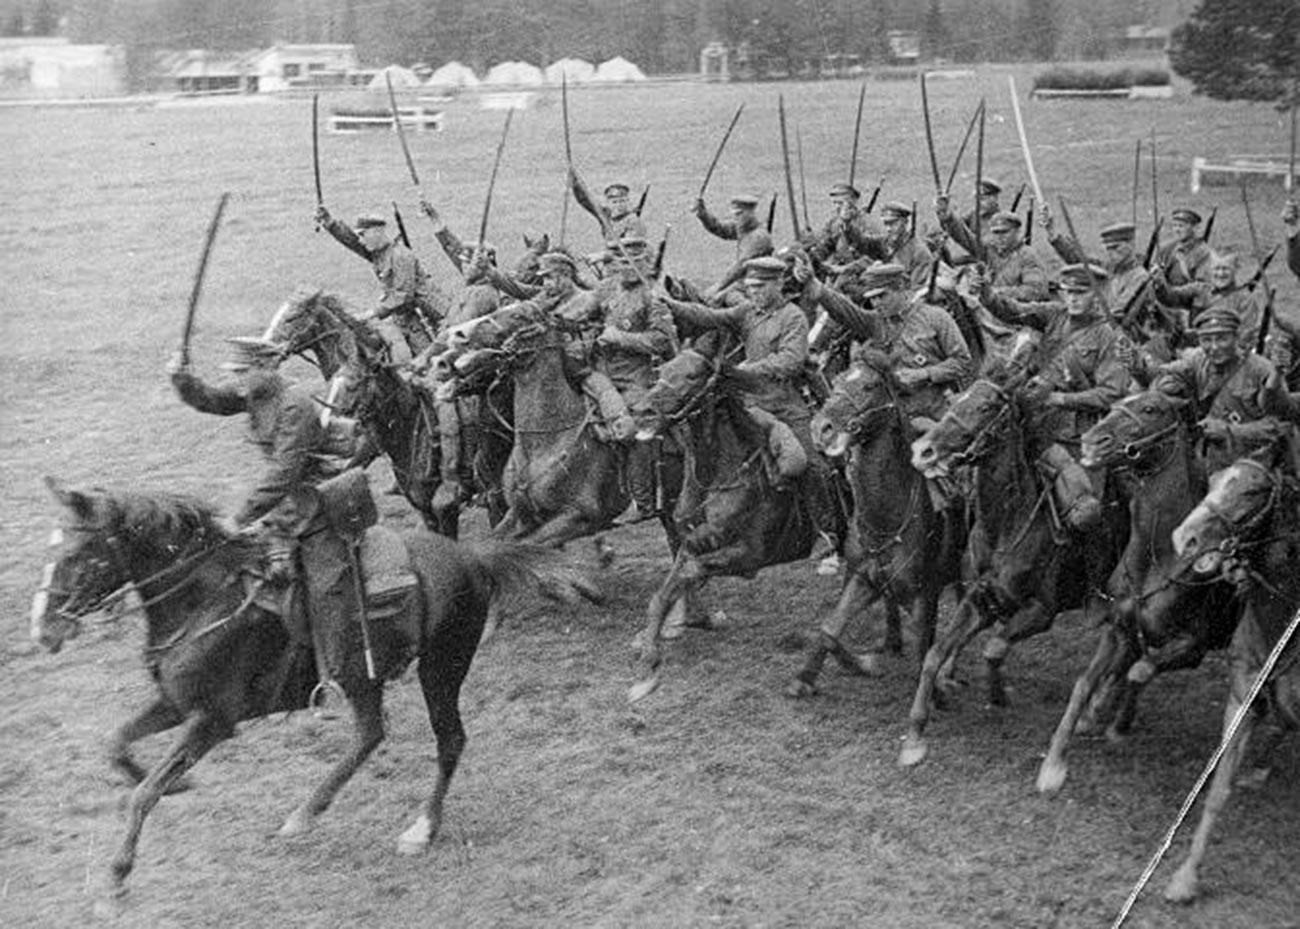 Konjenica Rdeče armade